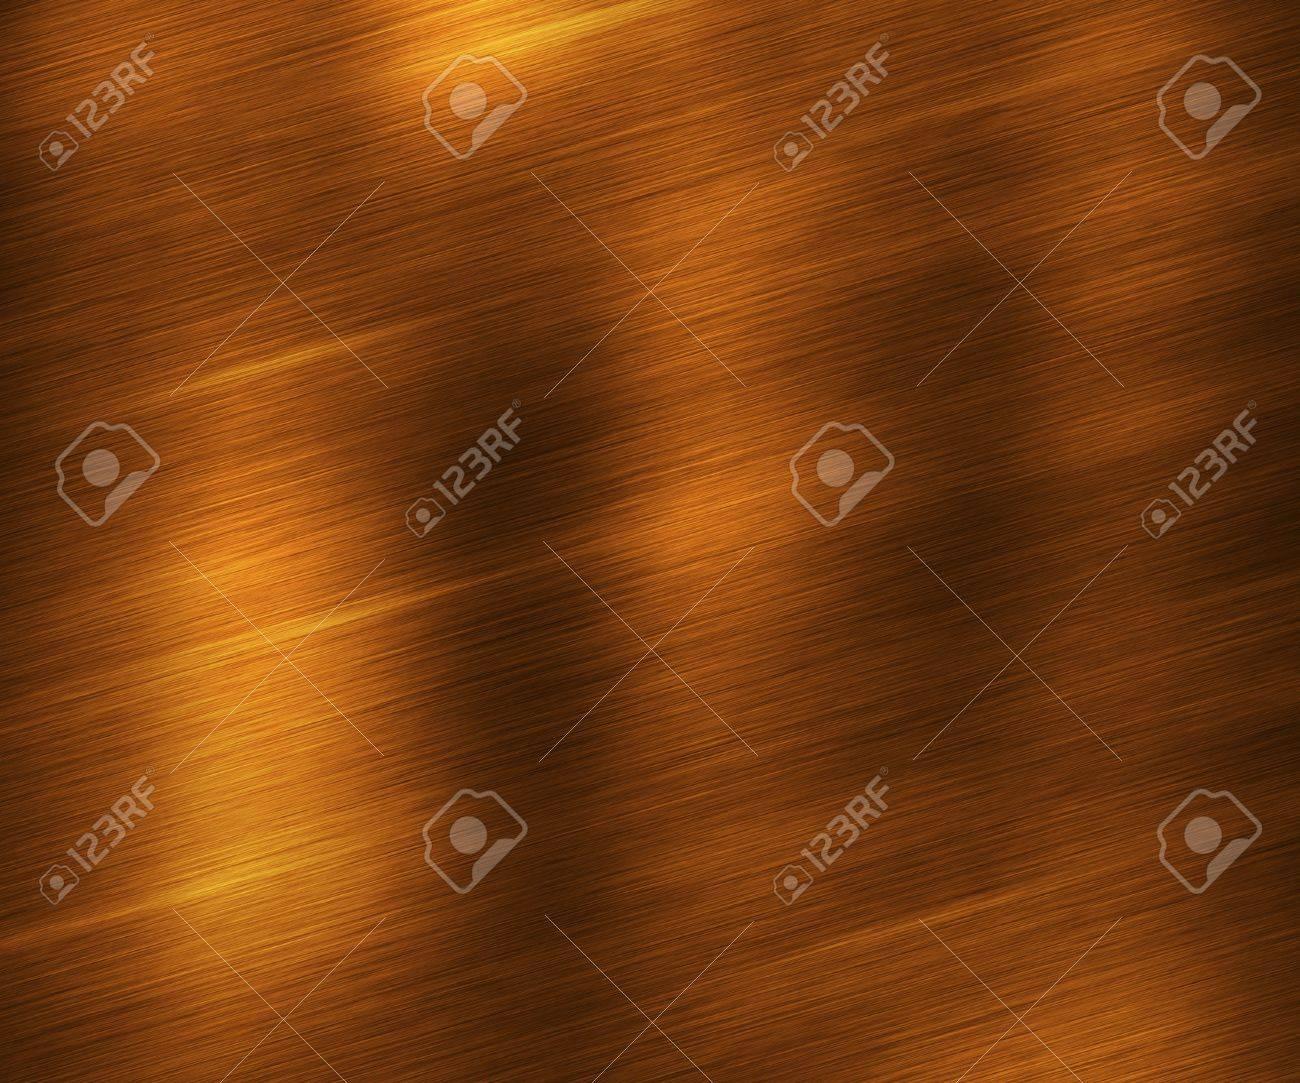 Gold Brushed Metal Texture Stock Photo - 17559619